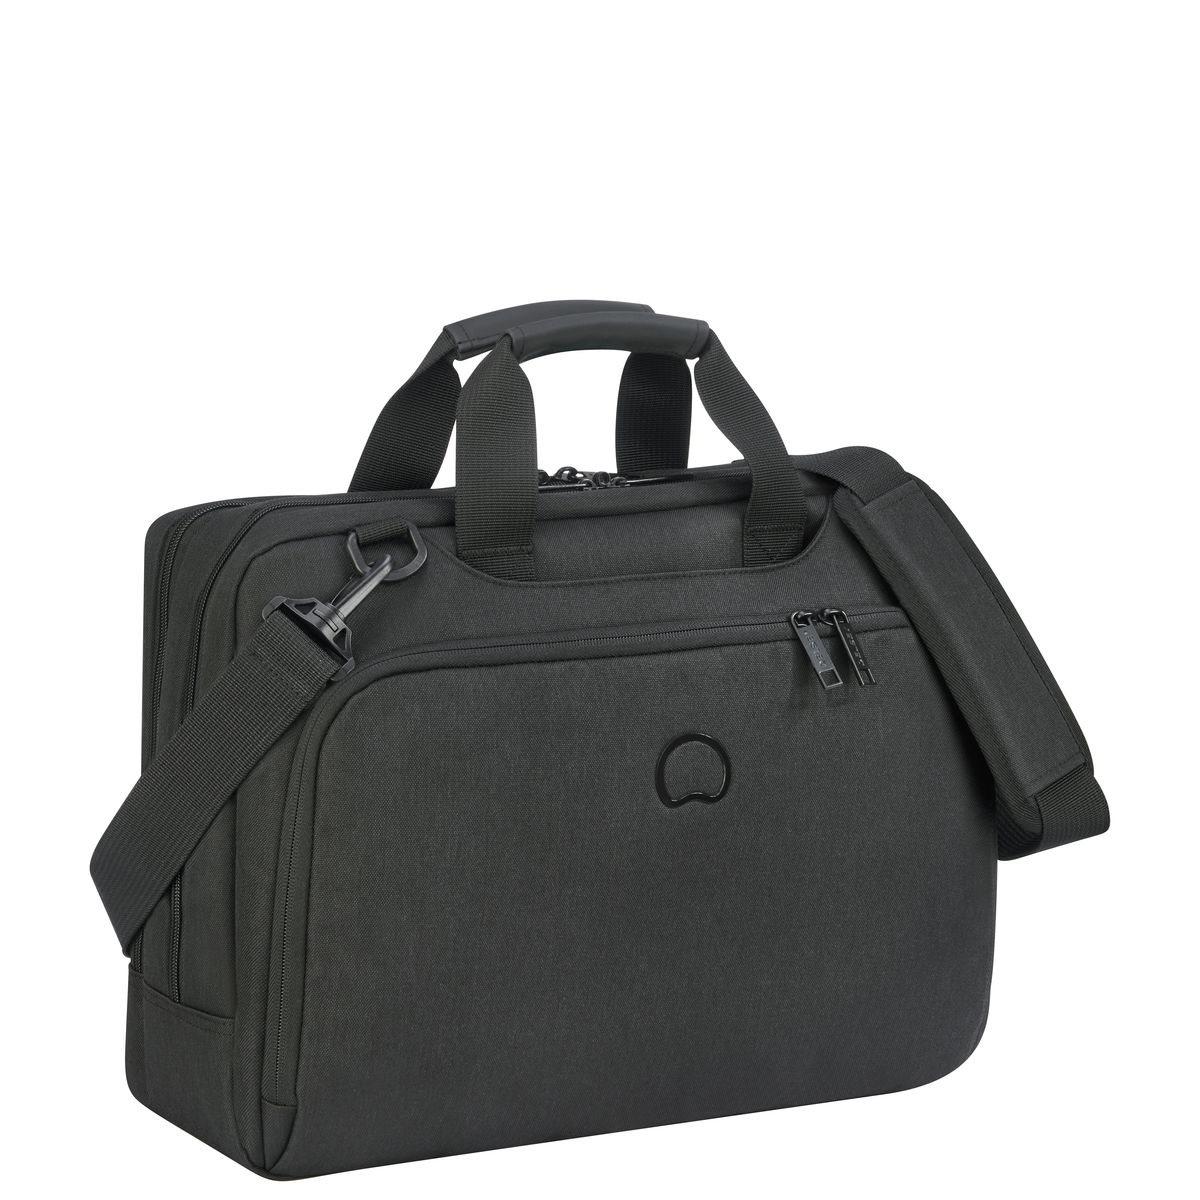 Delsey Χαρτοφύλακας laptop σειρά Esplanade 15L